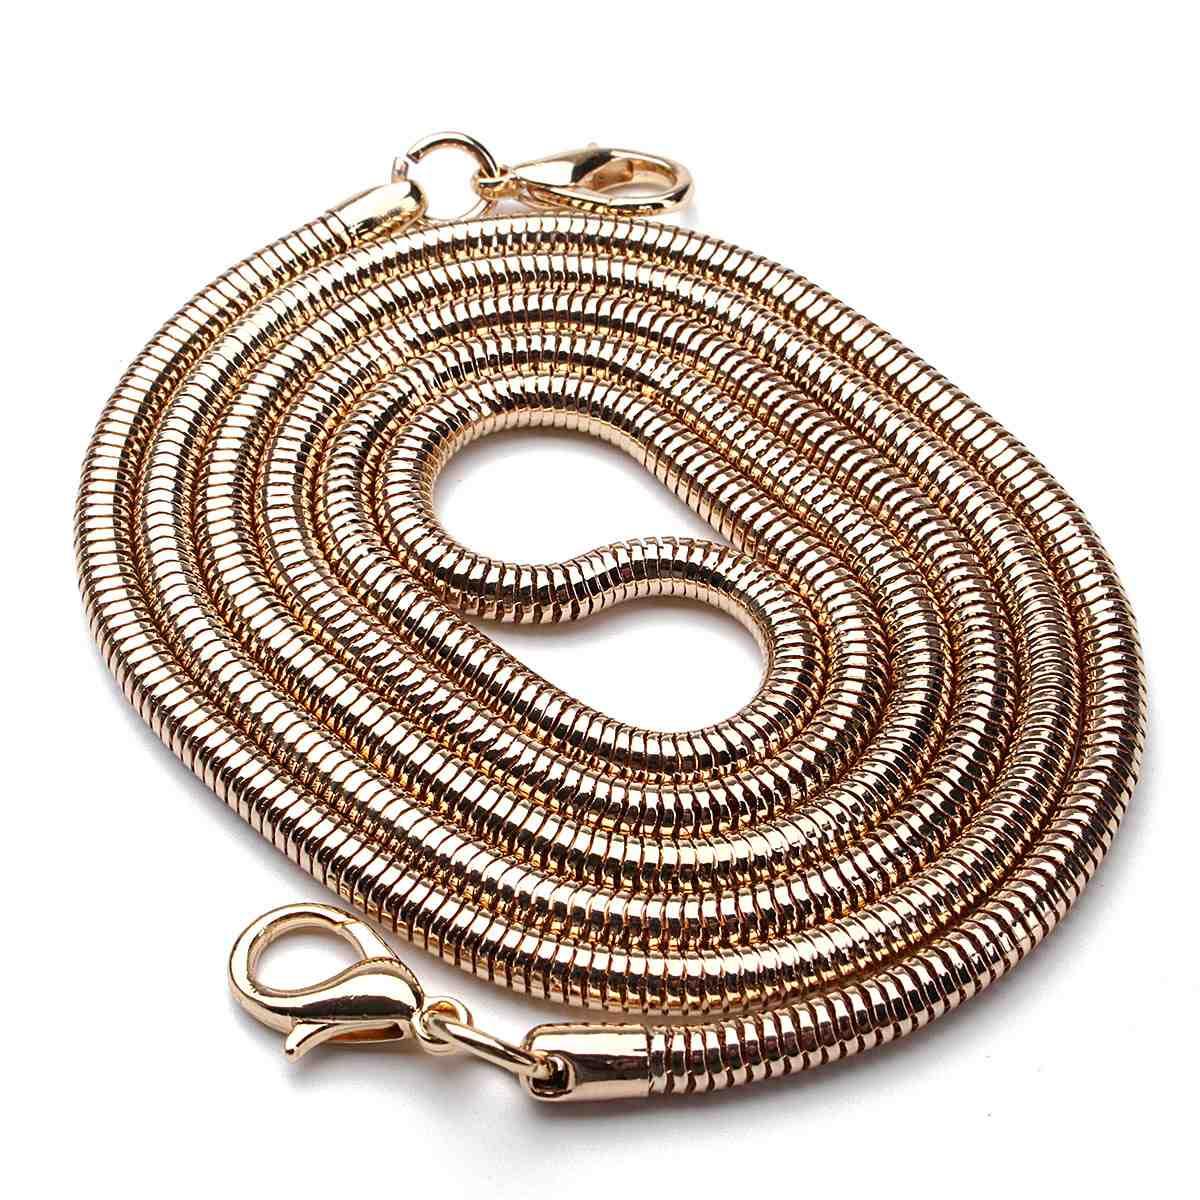 110CM Replacement Bag Straps DIY Chain Strap Handle Shoulder Belts Stainless Steel Copper Bag Metal Bands Bag Parts Accessories